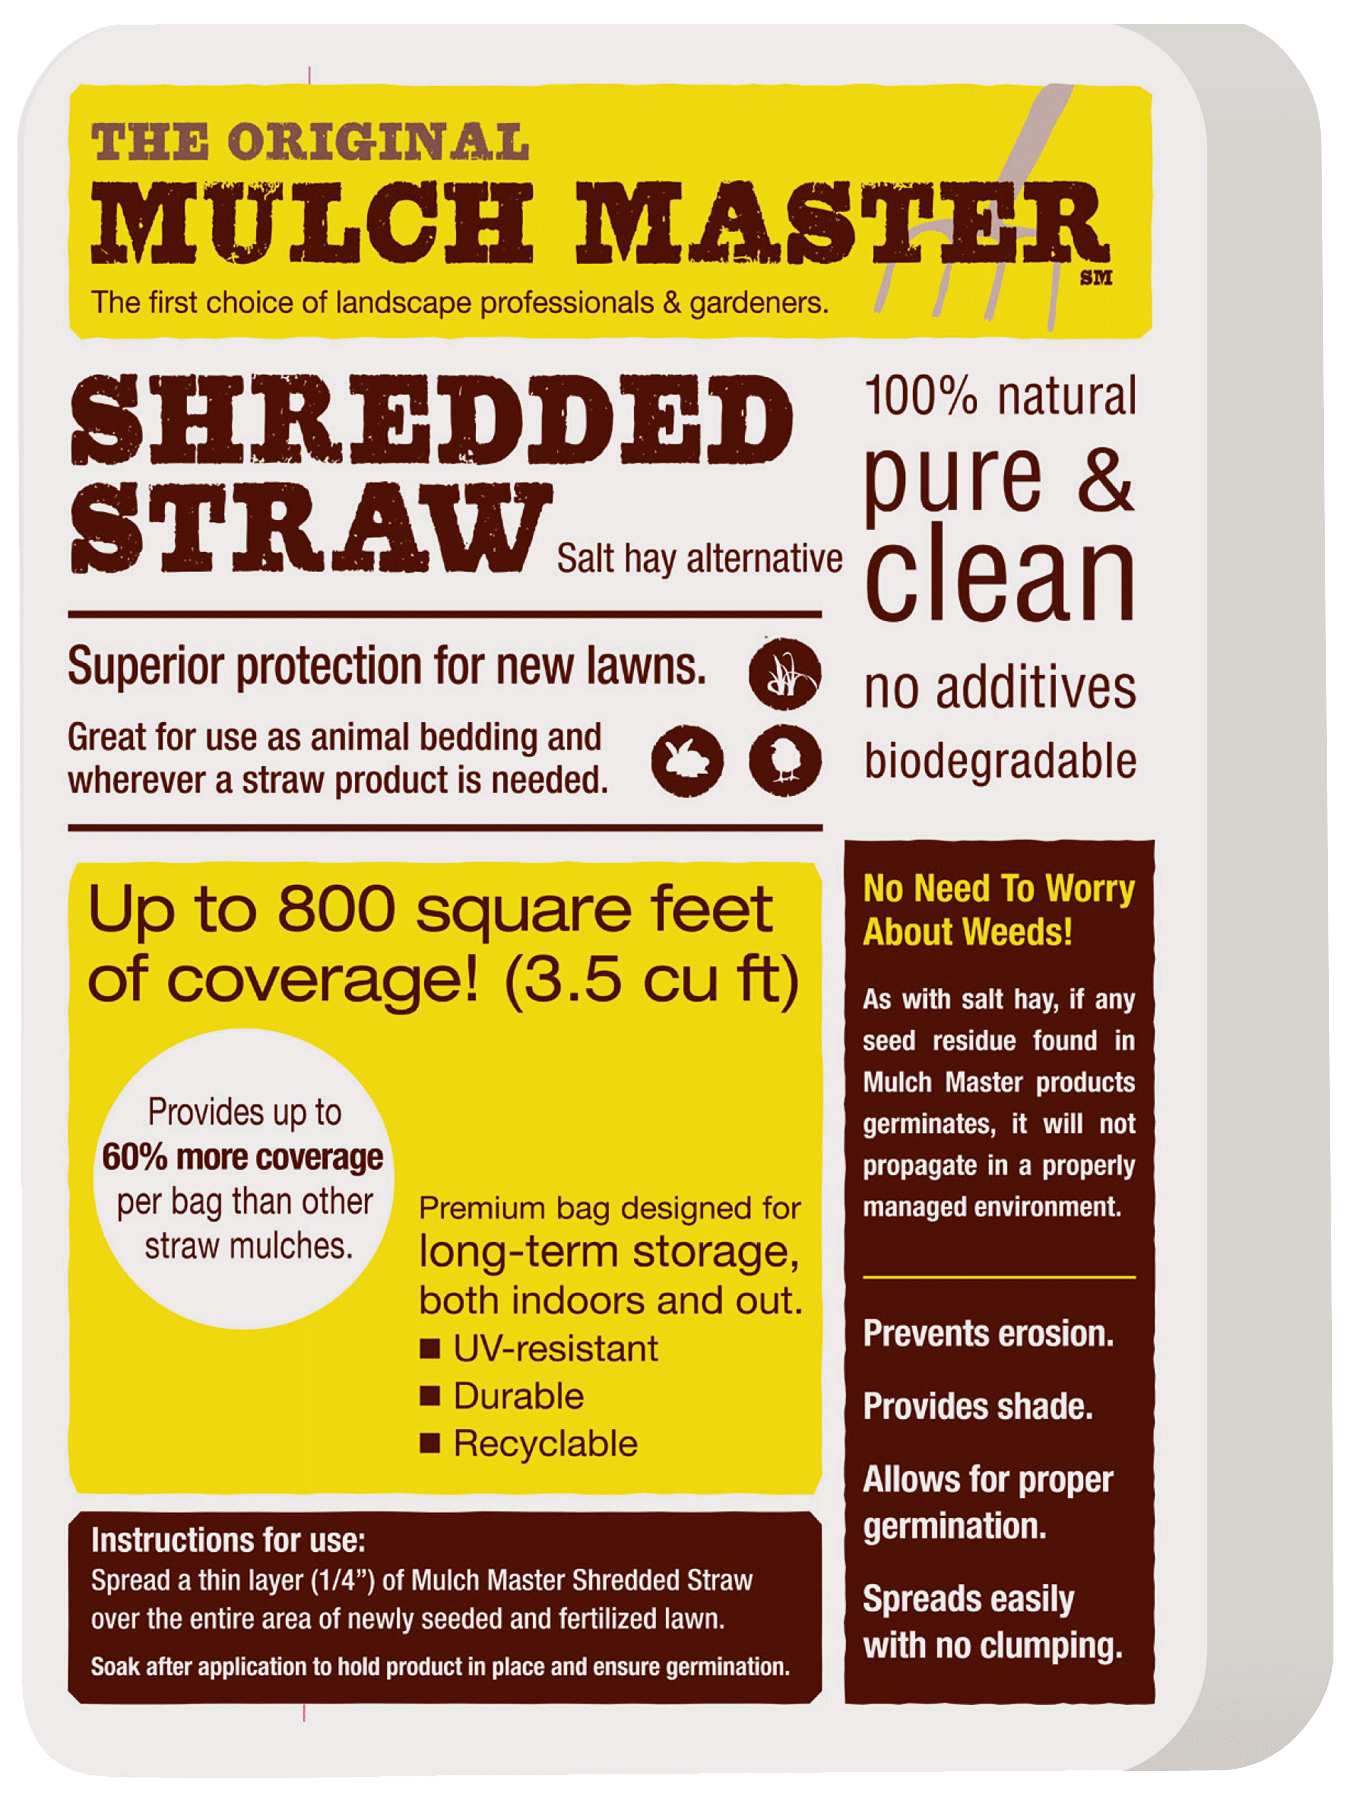 bale of mulch master straw